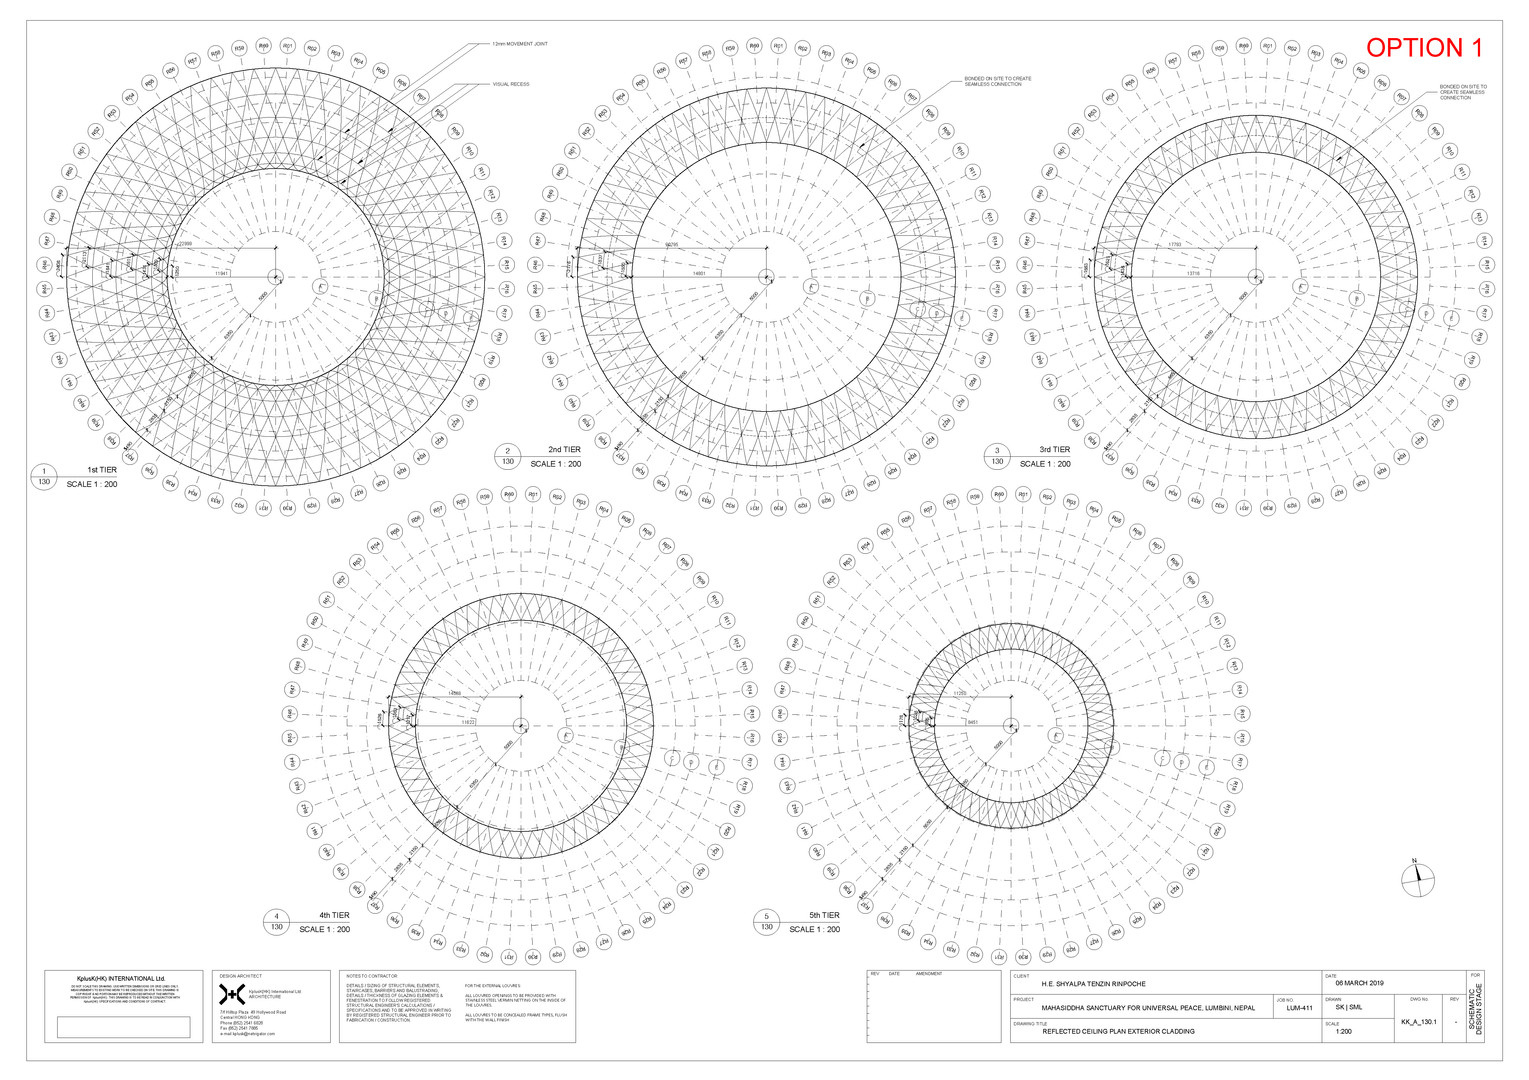 KK_A_130.1 Reflected Ceiling Plan Exteri